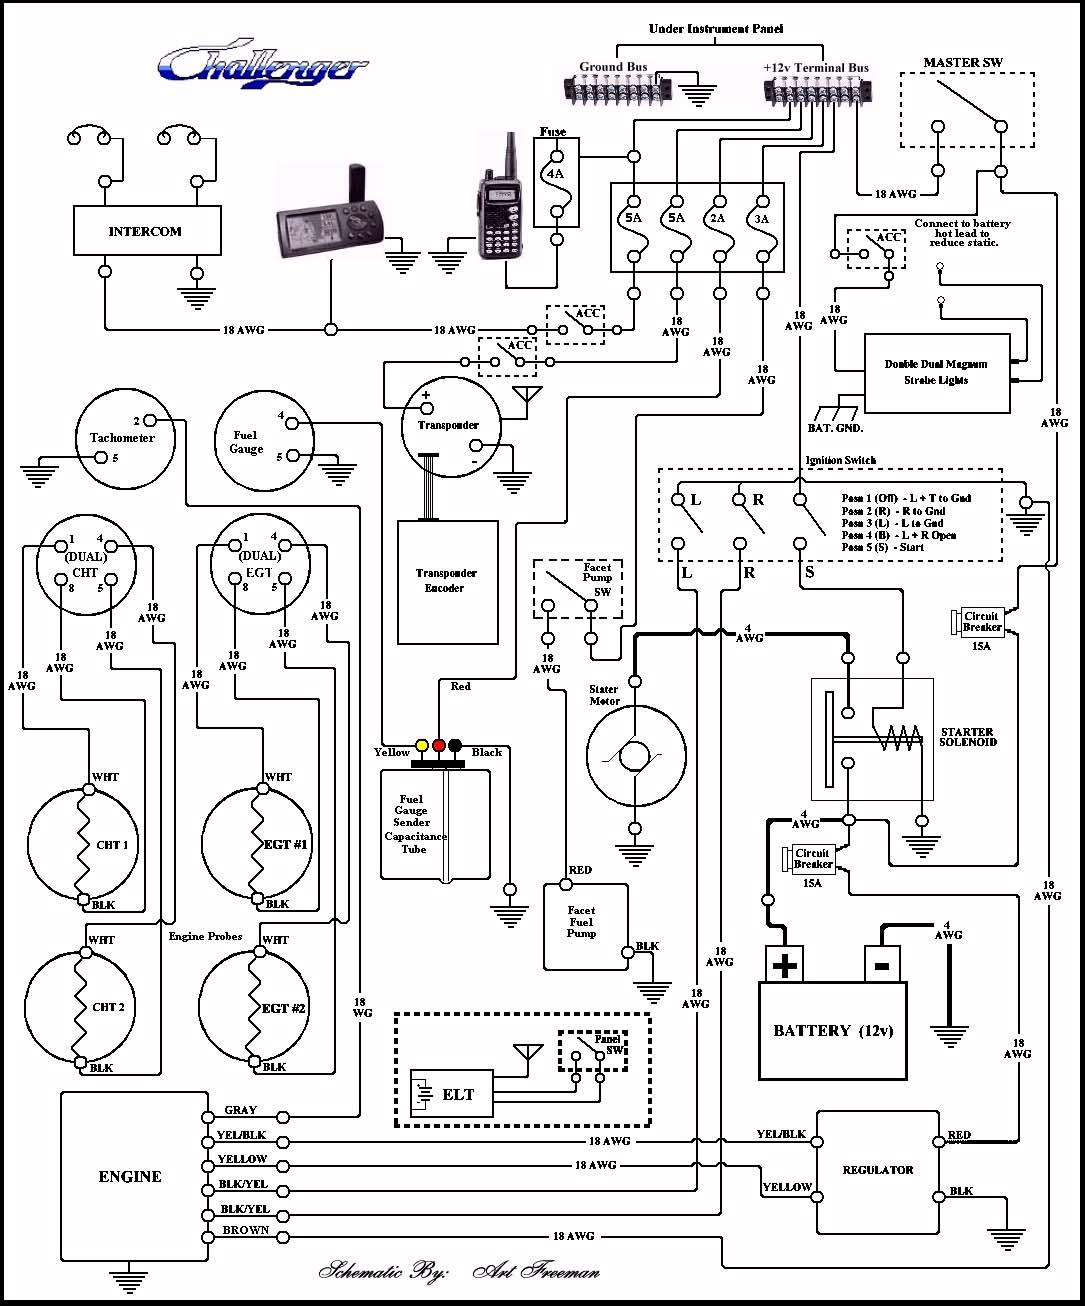 cessna 172 avionics wiring diagram within diagram wiring Automotive Wiring Harness cessna 150 wiring harness